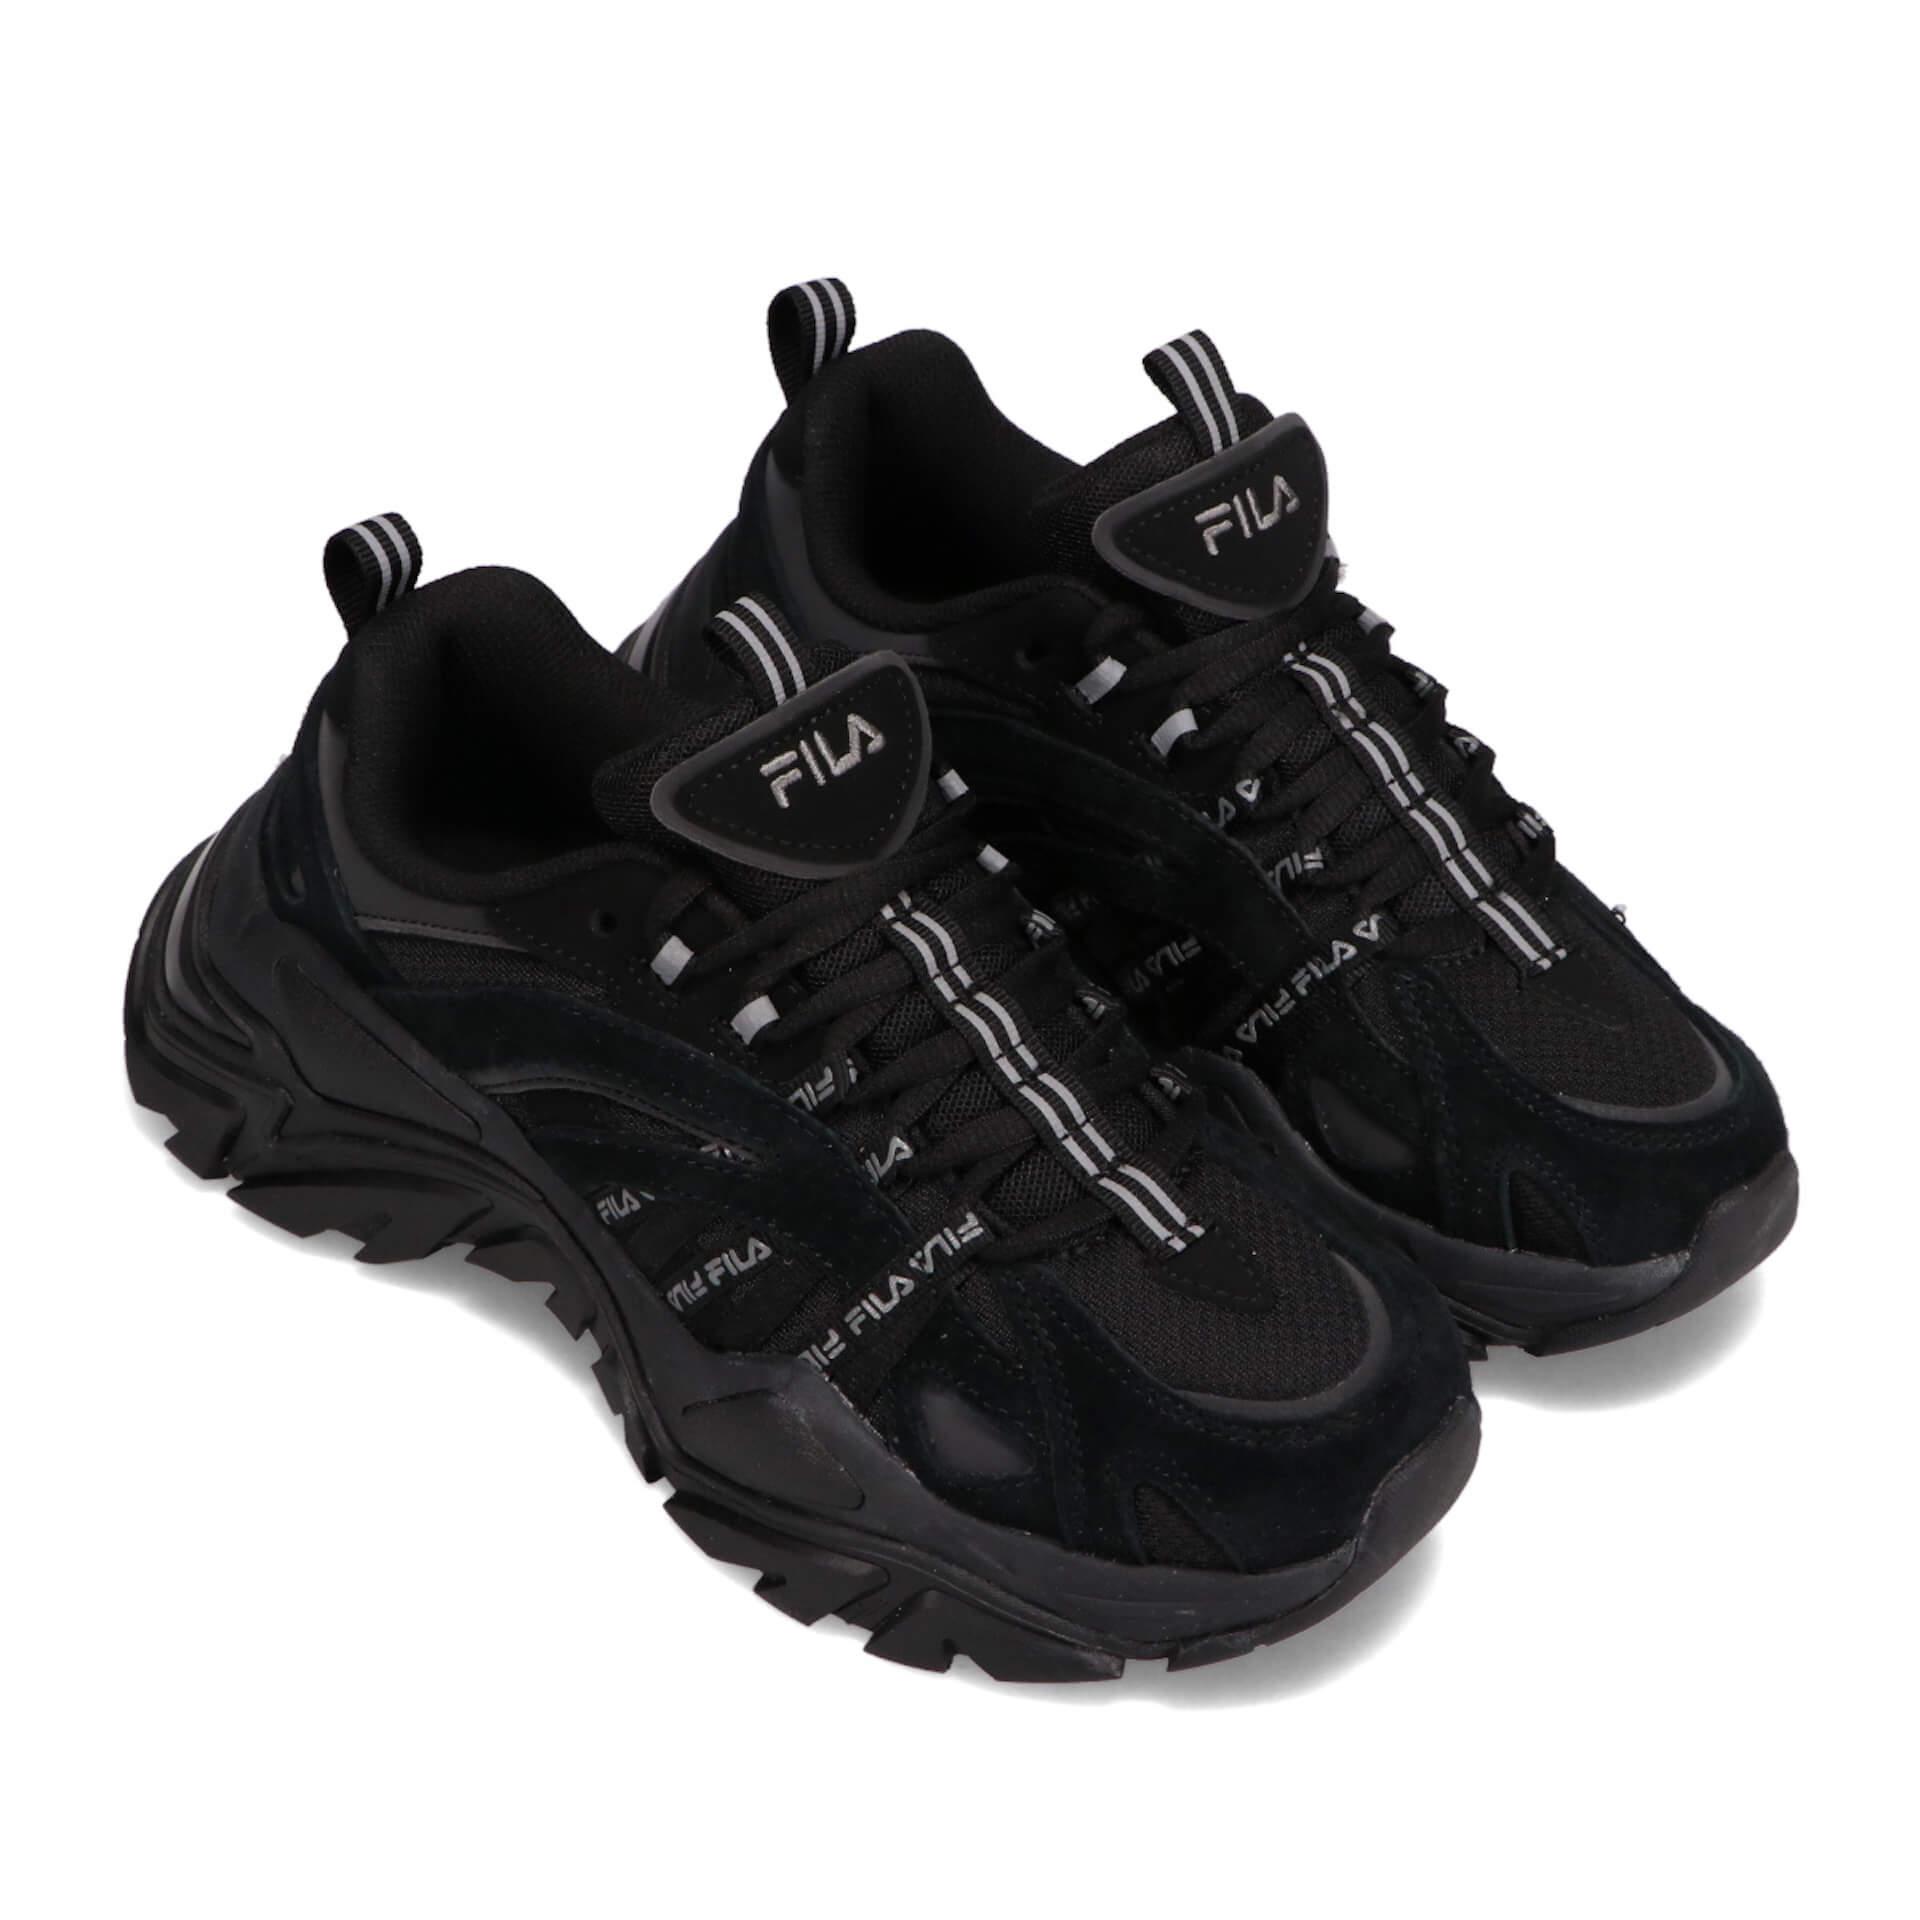 FILAの人気モデル『INTERATION』と『Z BUFFER2』にブラックベースが登場!『RAY RUN』ニューカラーもatmos系列限定で発売 fashion201216_atmos_fila_9